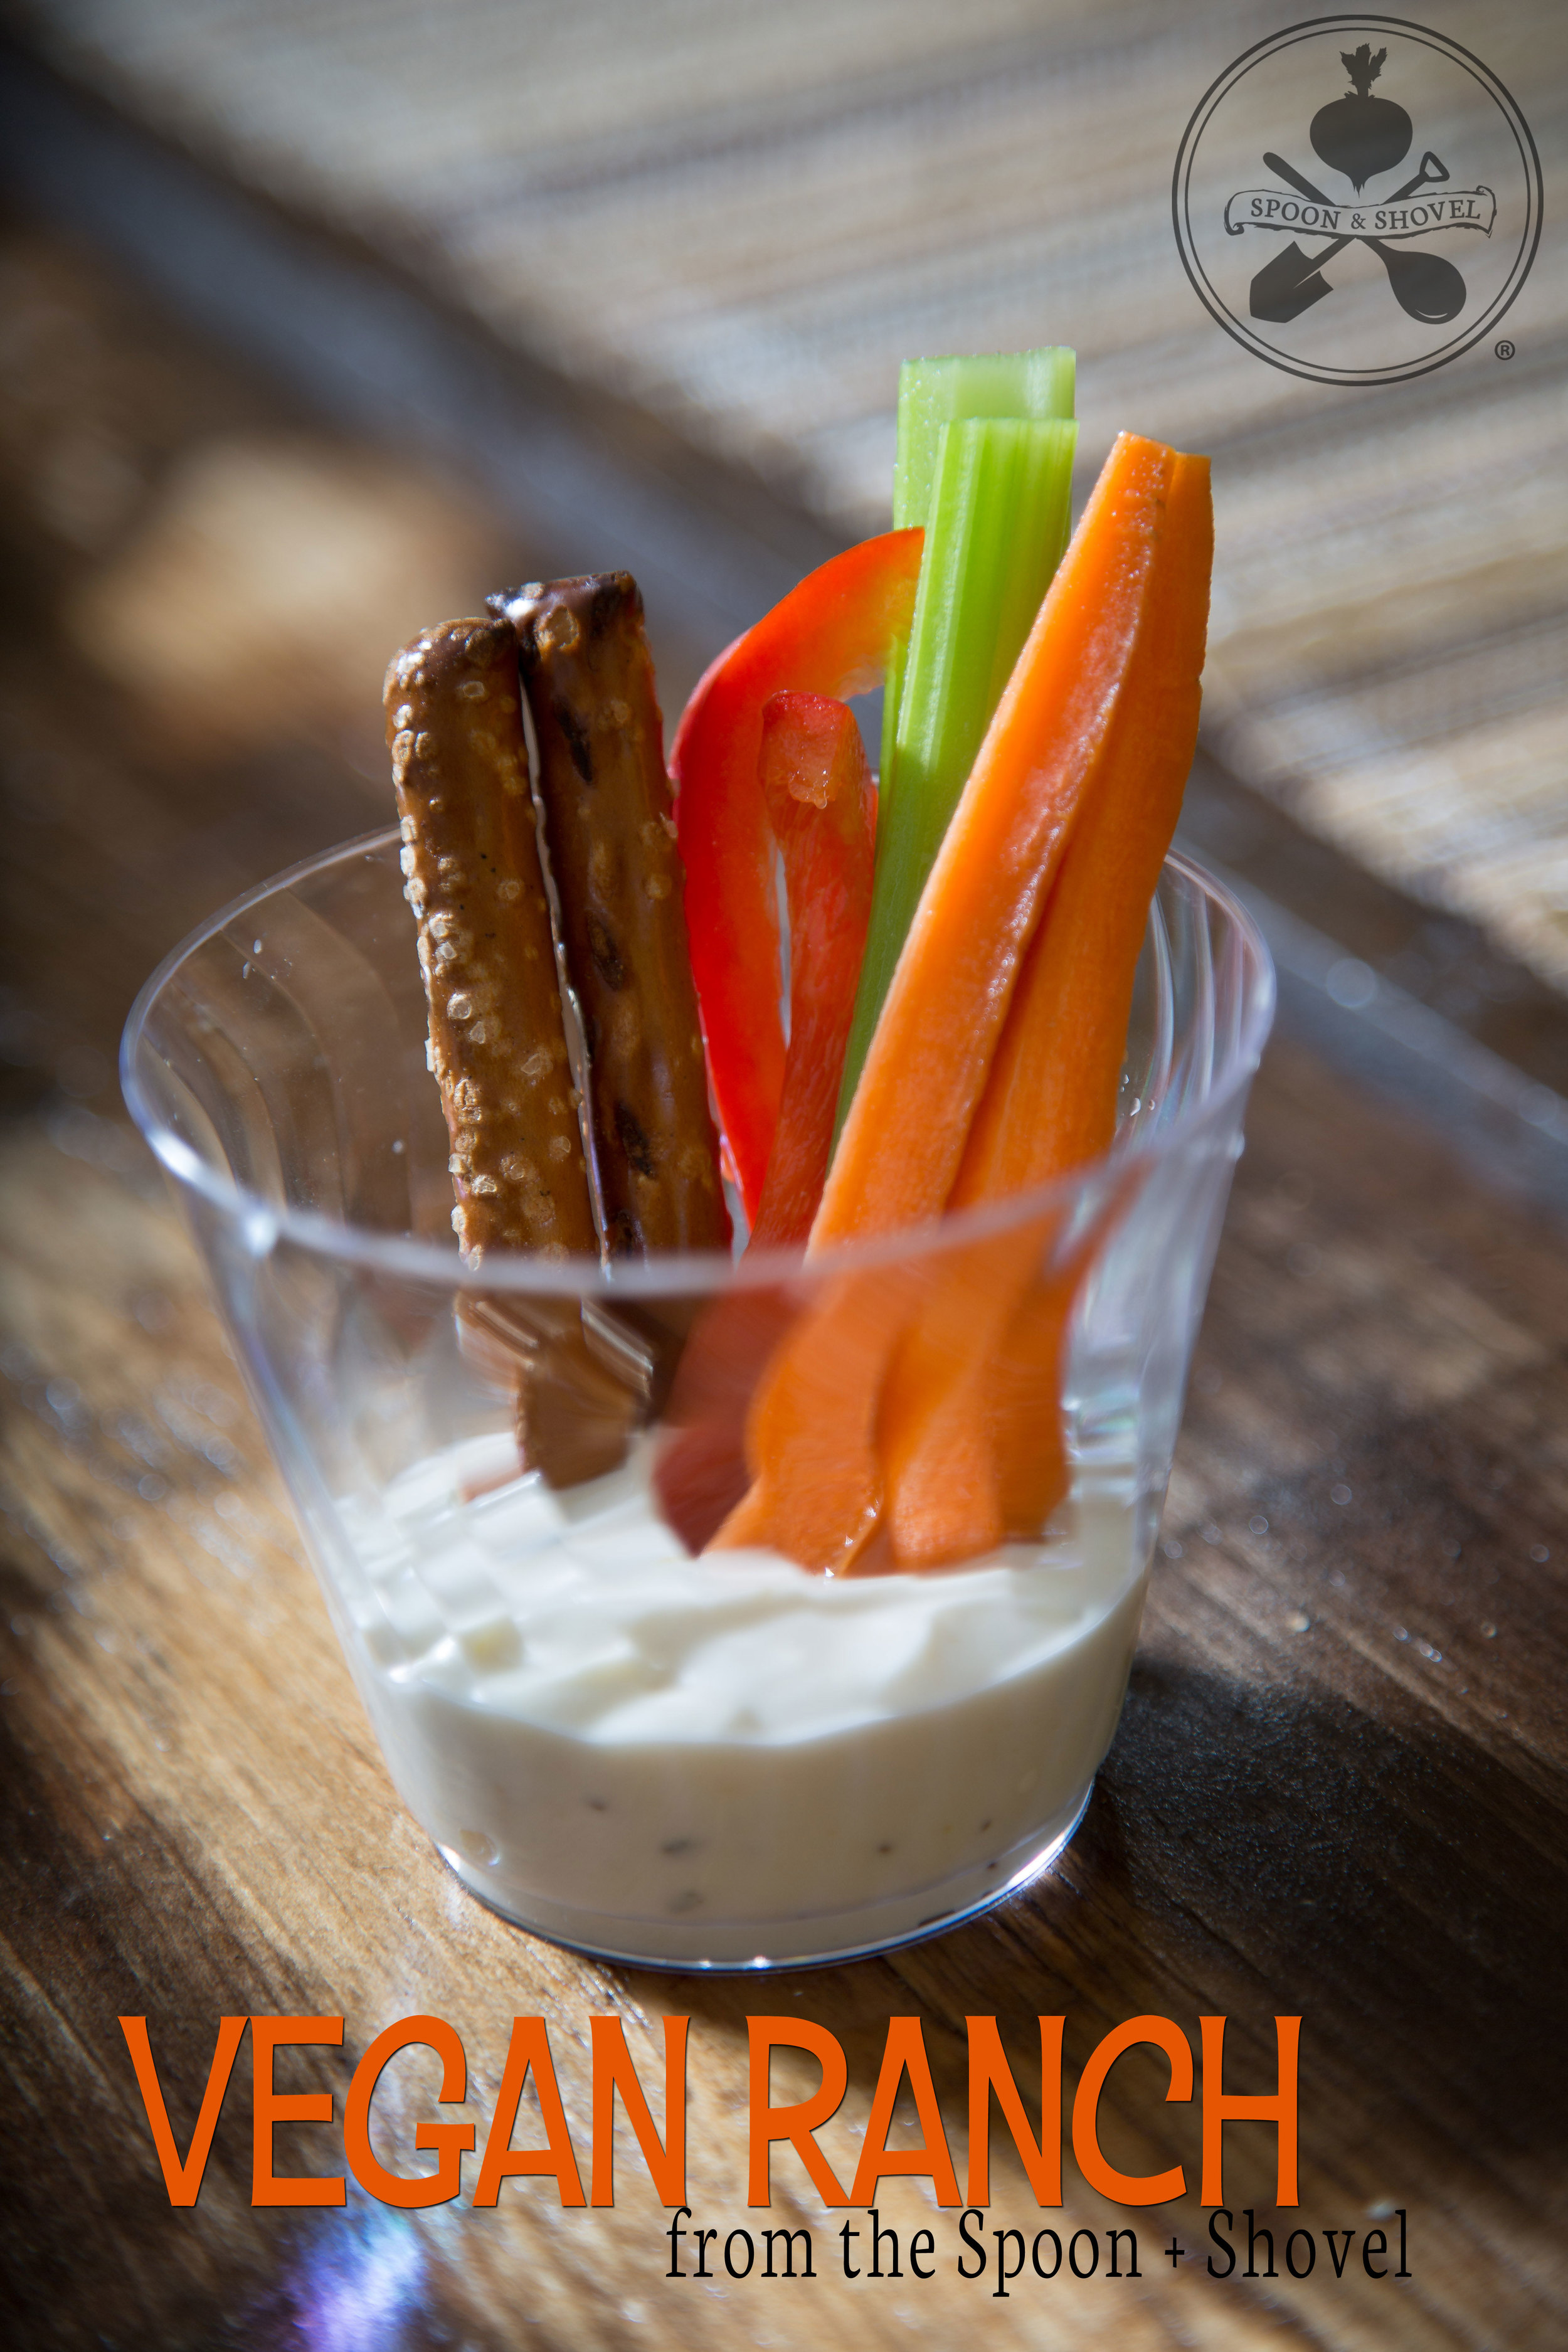 Vegan ranch sauce from The Spoon + Shovel